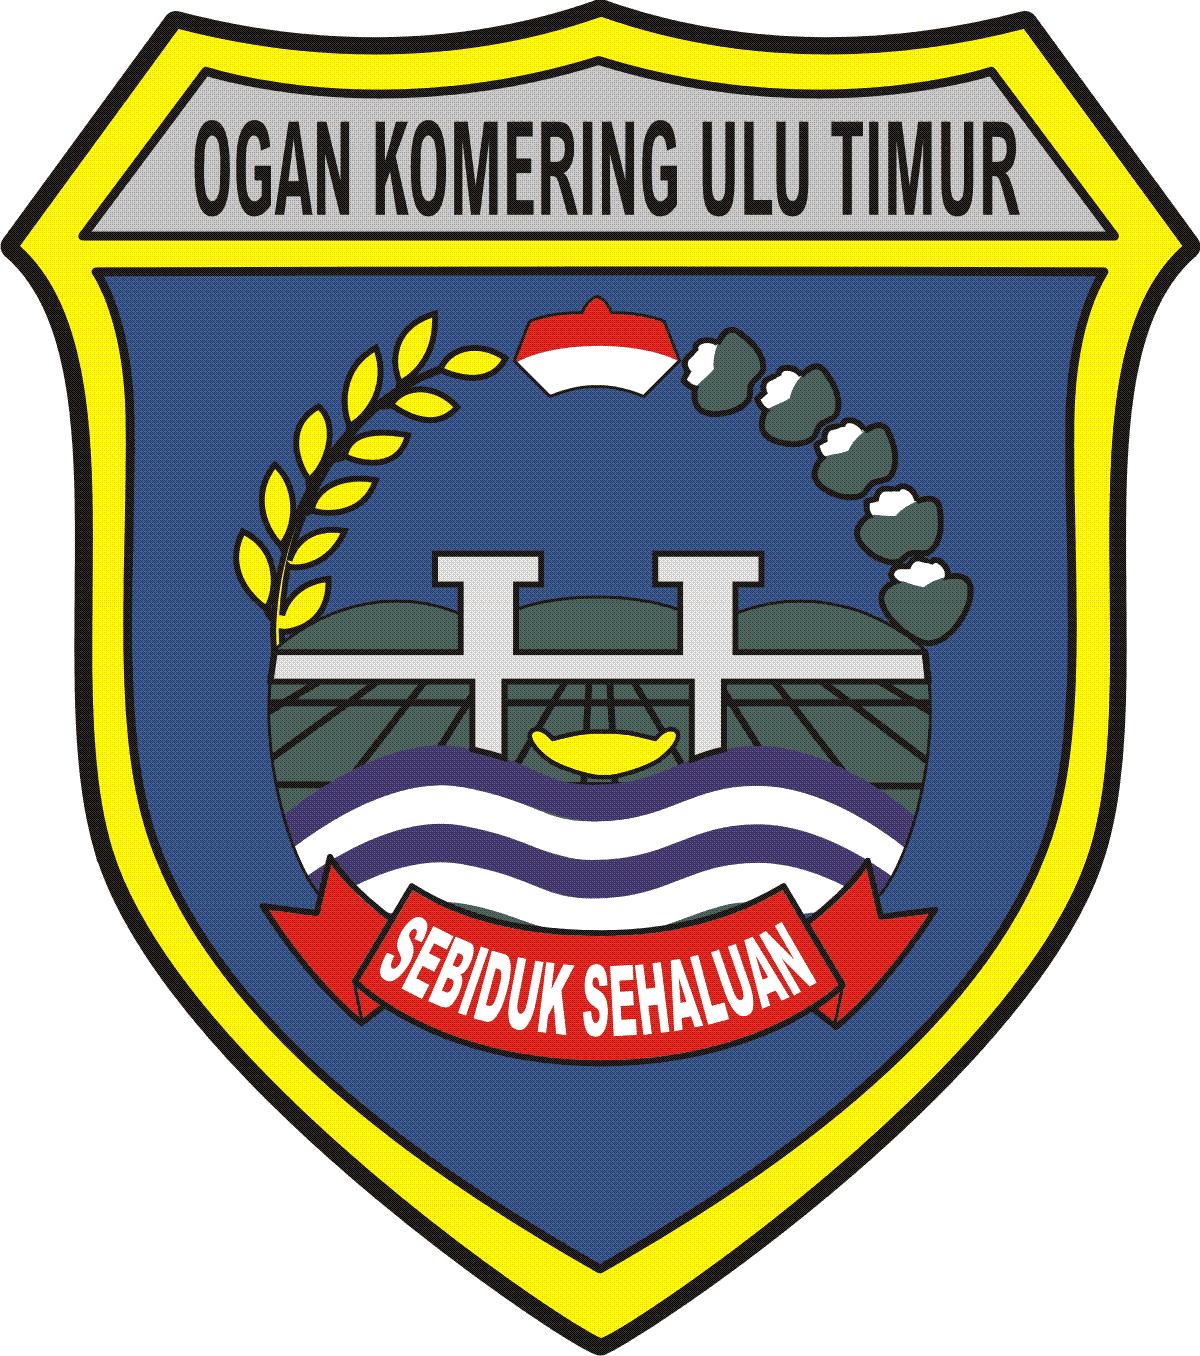 Arkaonline Download Logo Oku Timur